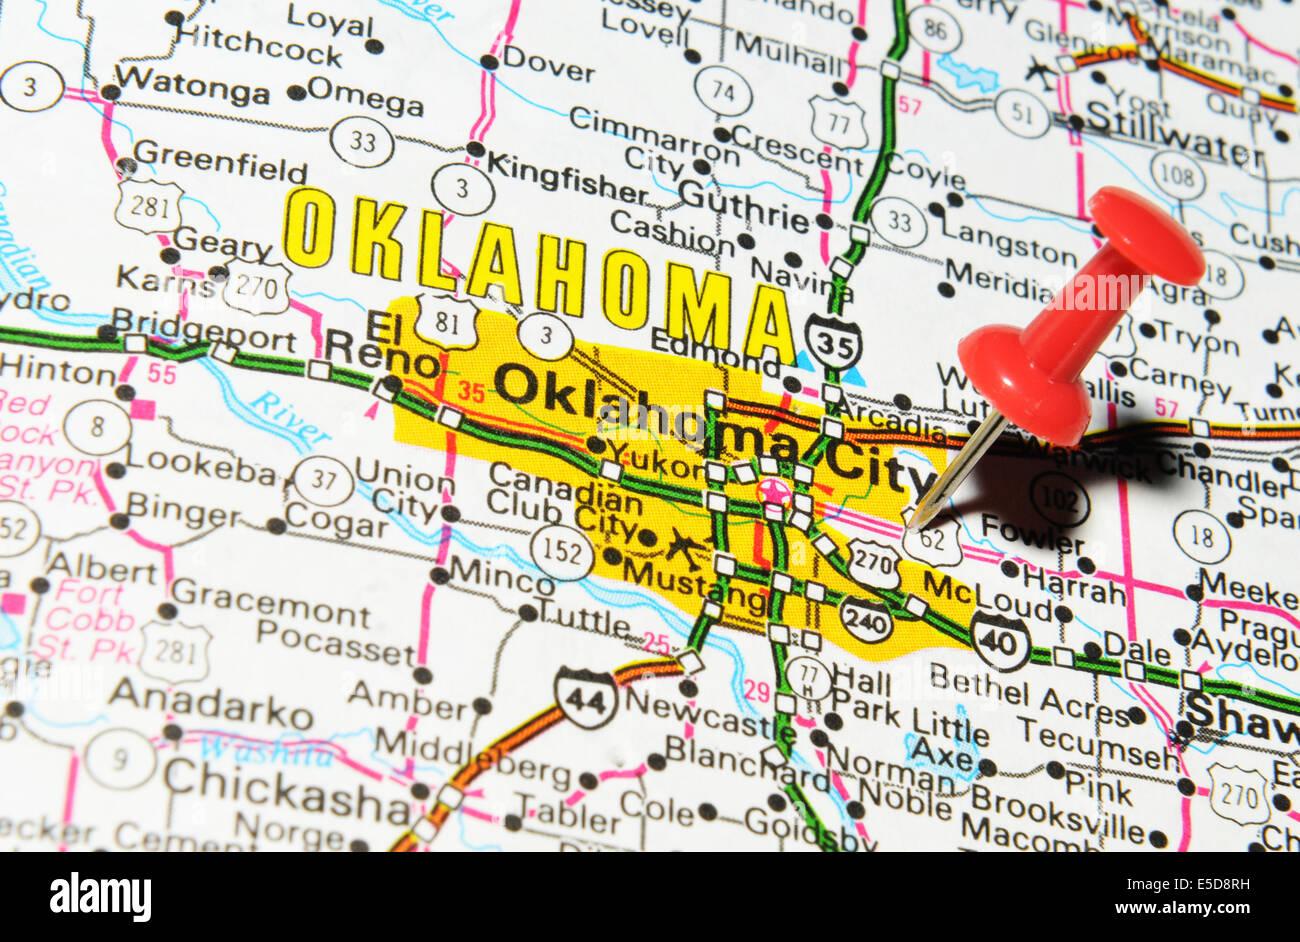 Oklahoma City On Us Map Stock Photo 72207061 Alamy - Oklahoma-on-the-us-map